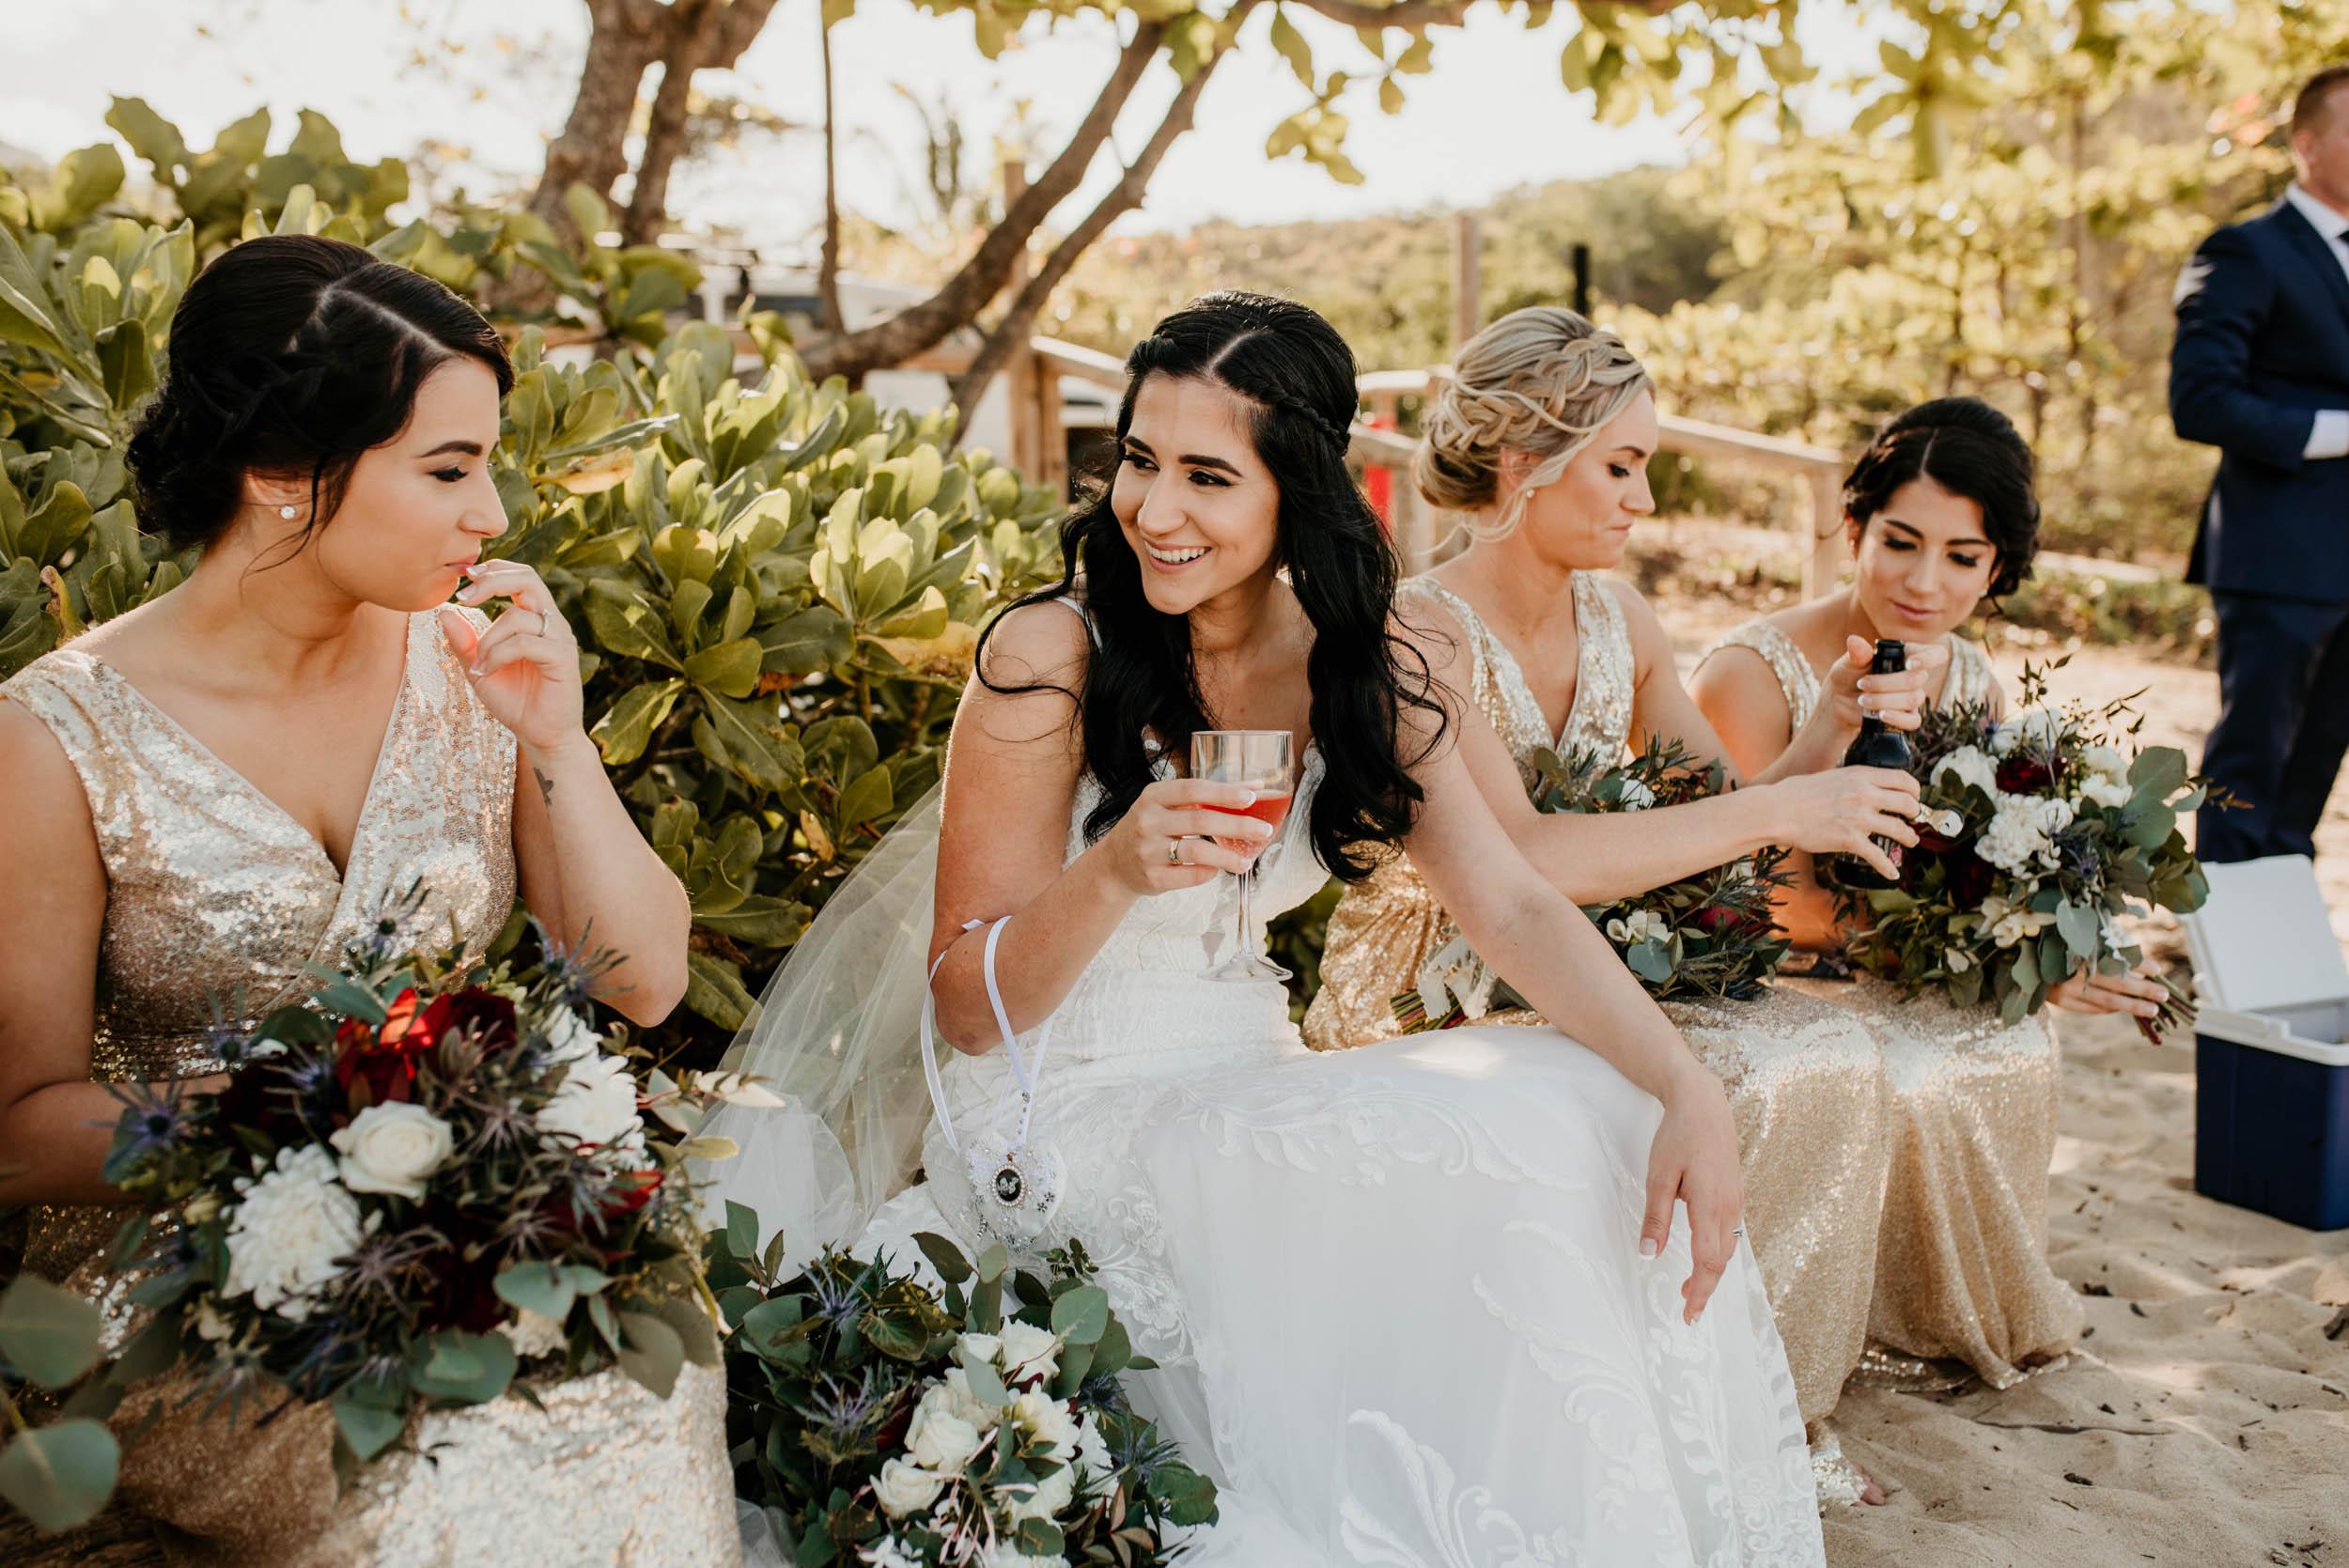 The Raw Photographer - Cairns Wedding Photographer - Beach Palm Cove Ceremony - Dress Irene Costa's Devine Bridal - Queensland-40.jpg